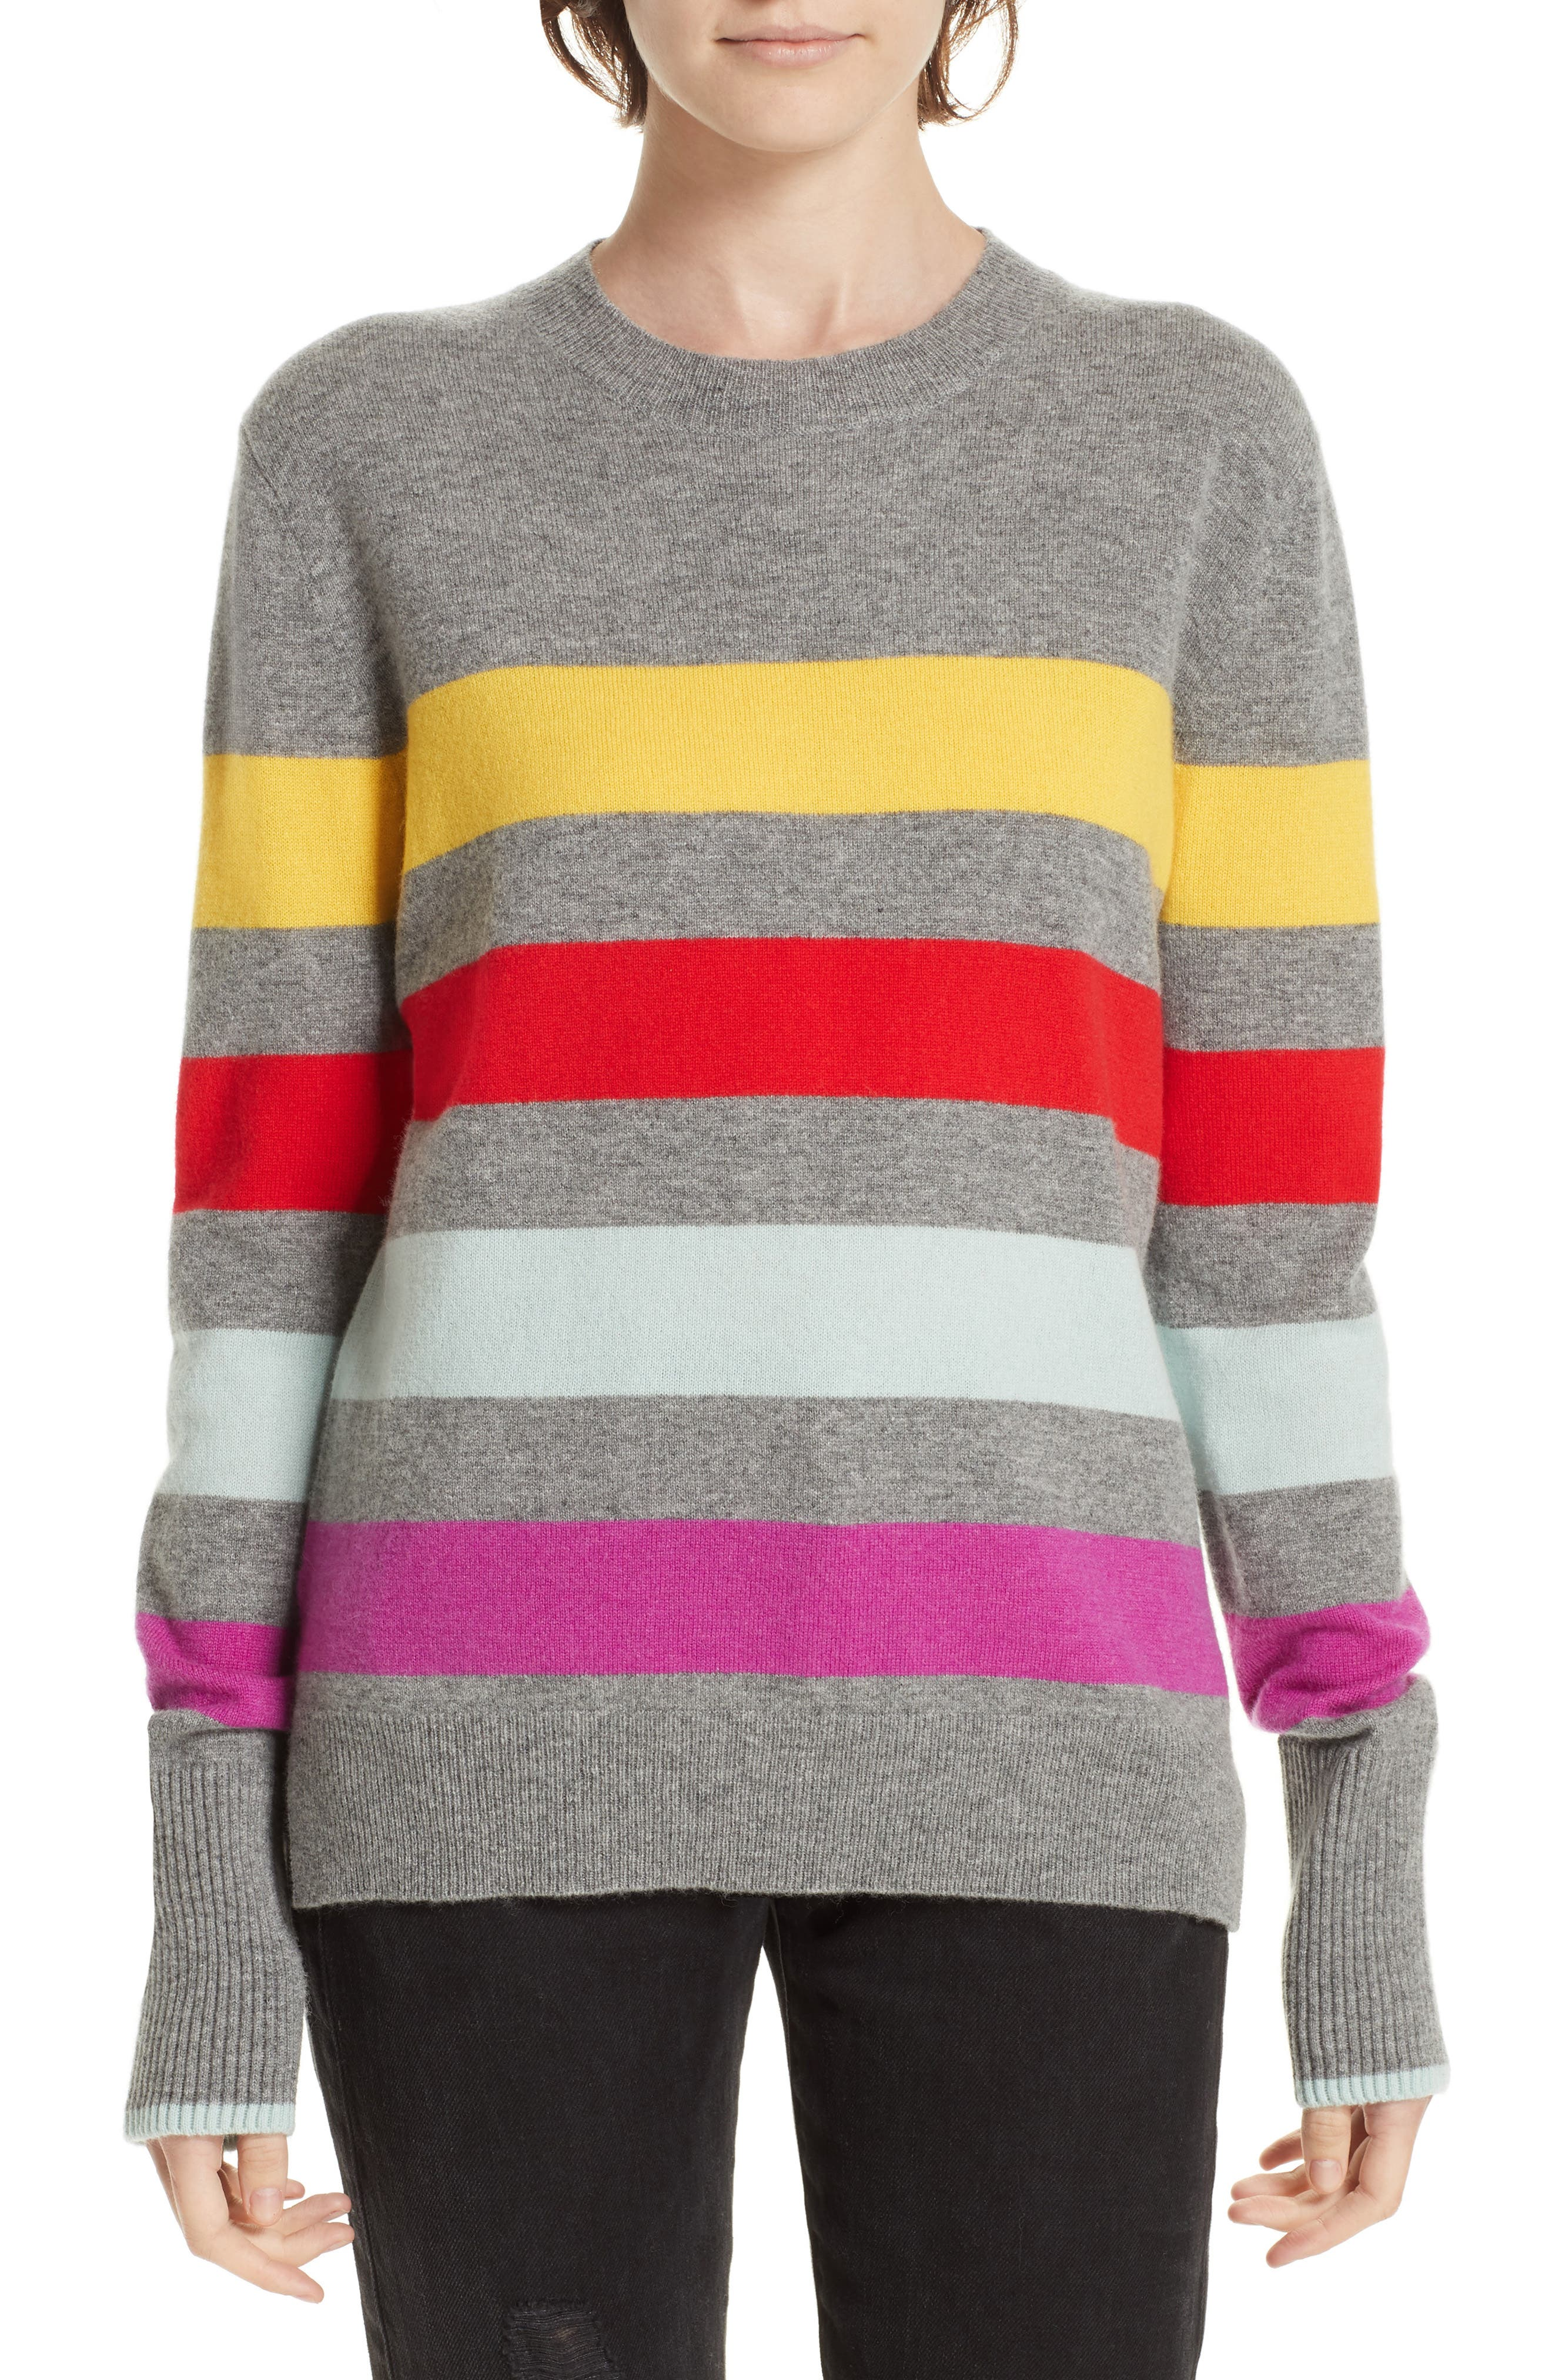 LA LIGNE Candy Stripe Sweater in Grey Marle/ Rainbow